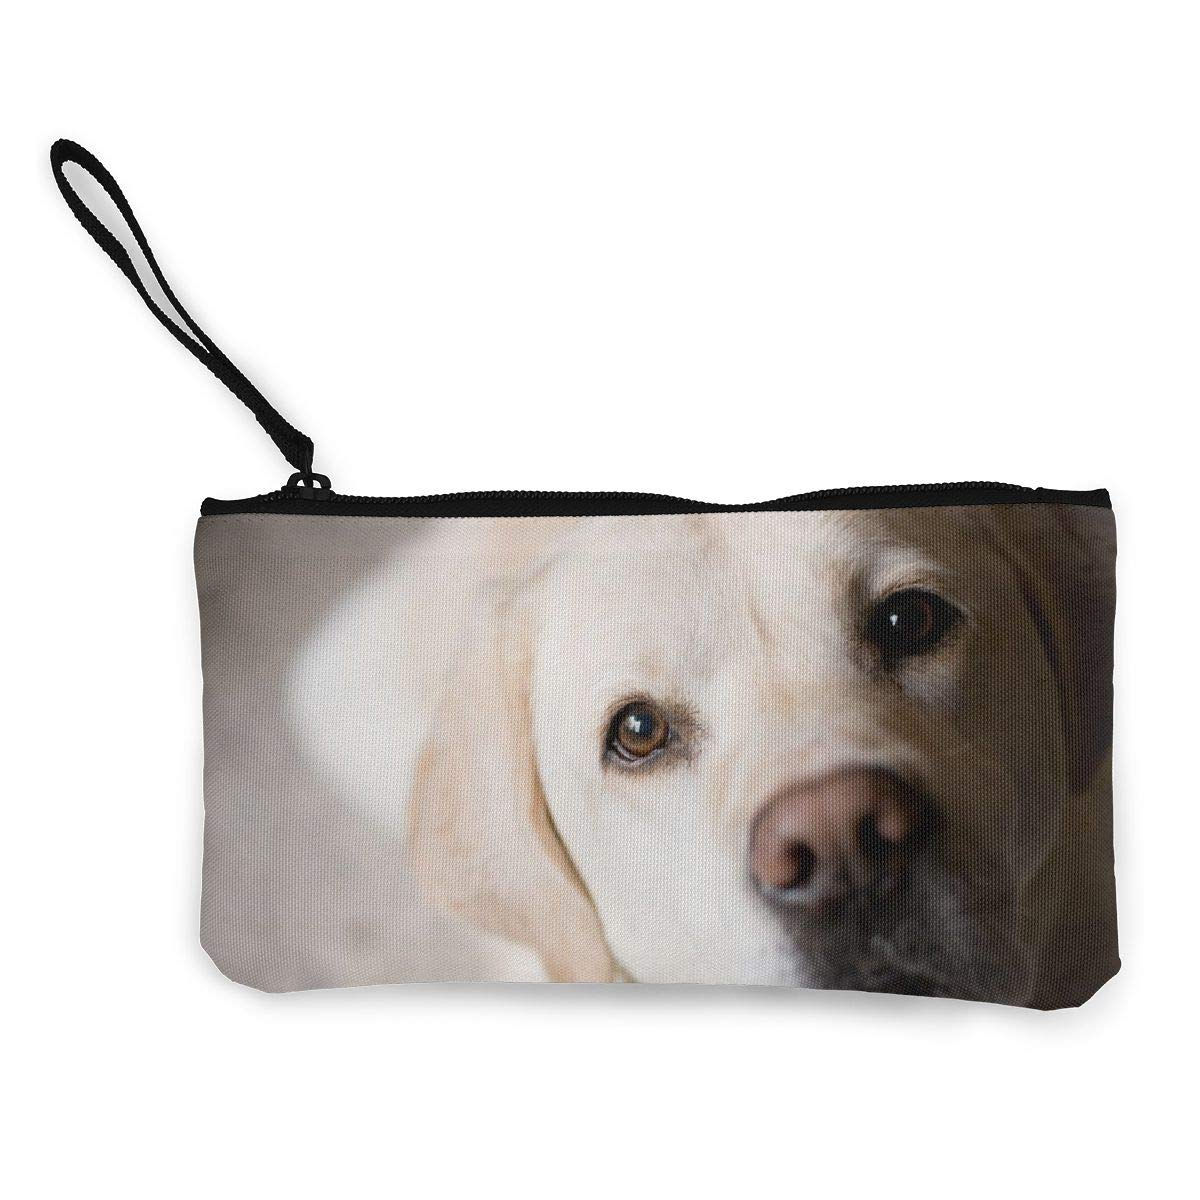 YUANSHAN Cute Labrador Dog Unisex Canvas Coin Purse Change Cash Bag Zipper Small Purse Wallets with Handle